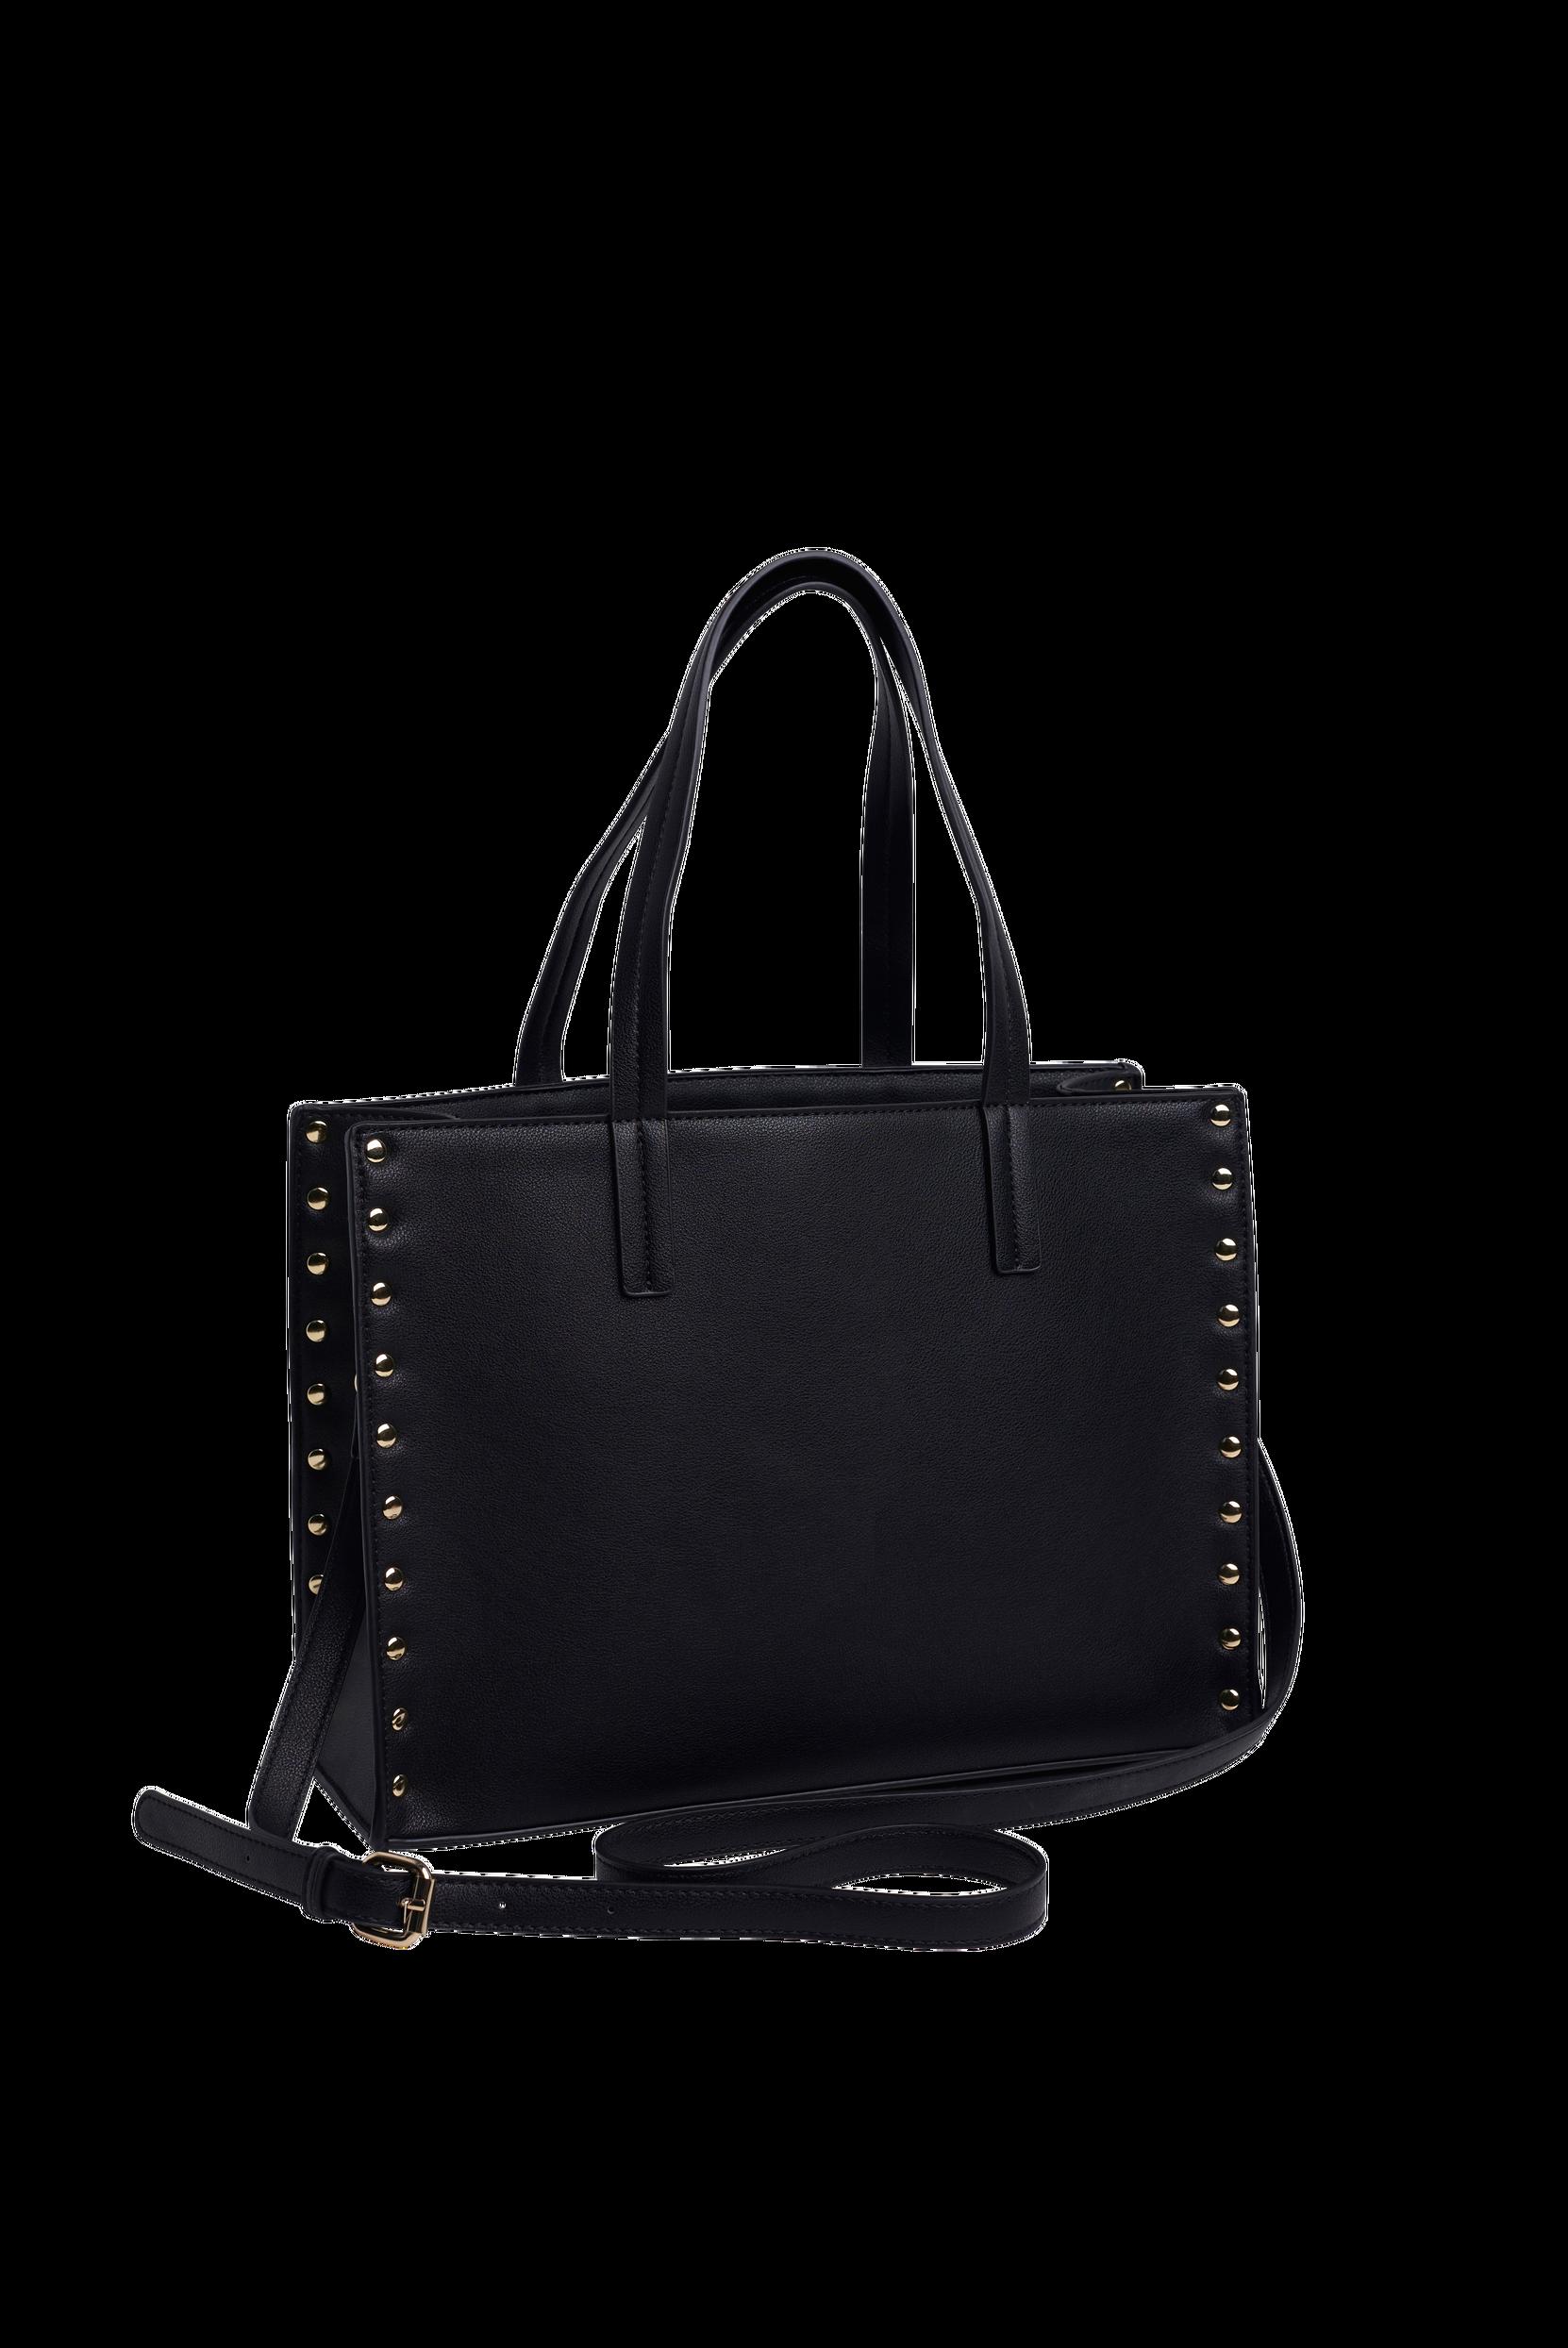 Khloe-laukku